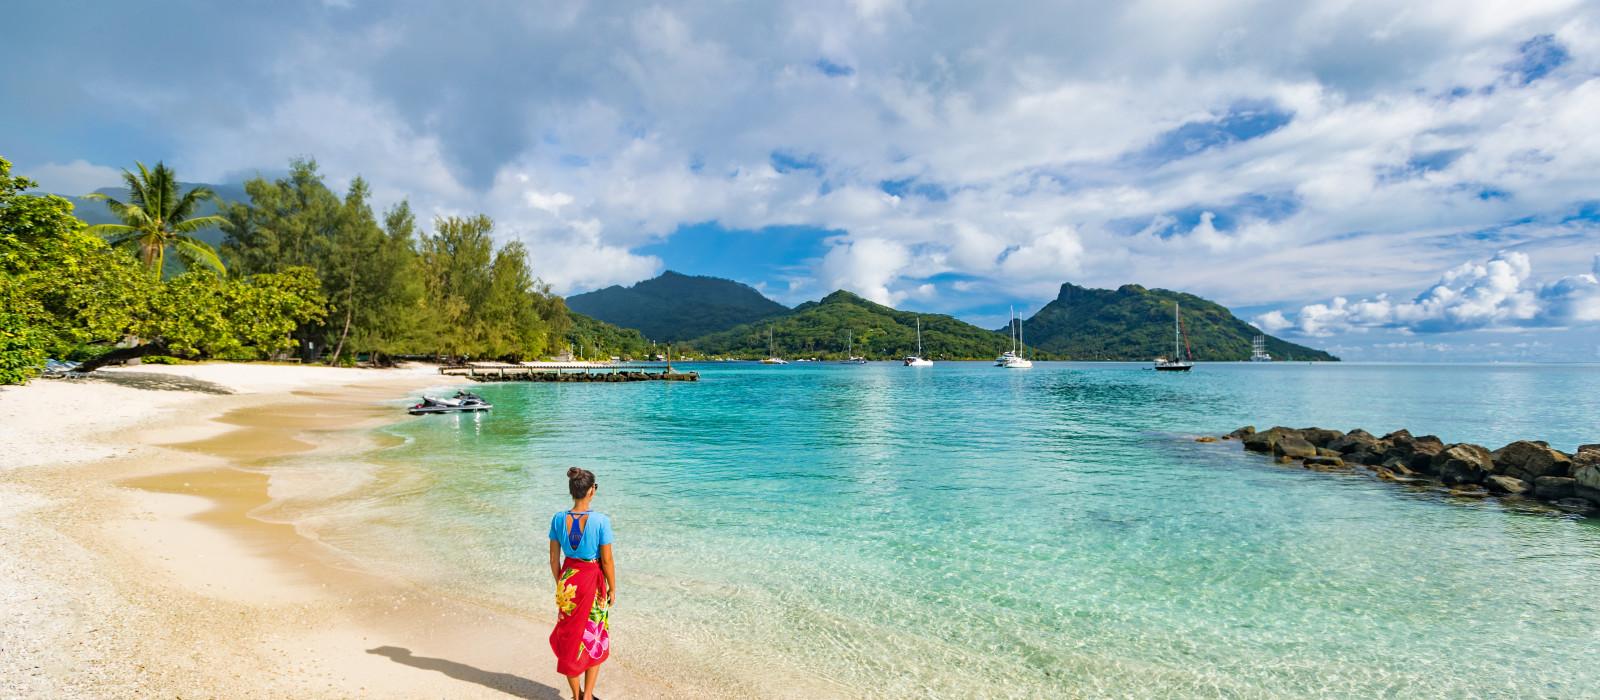 Destination Huahine French Polynesia